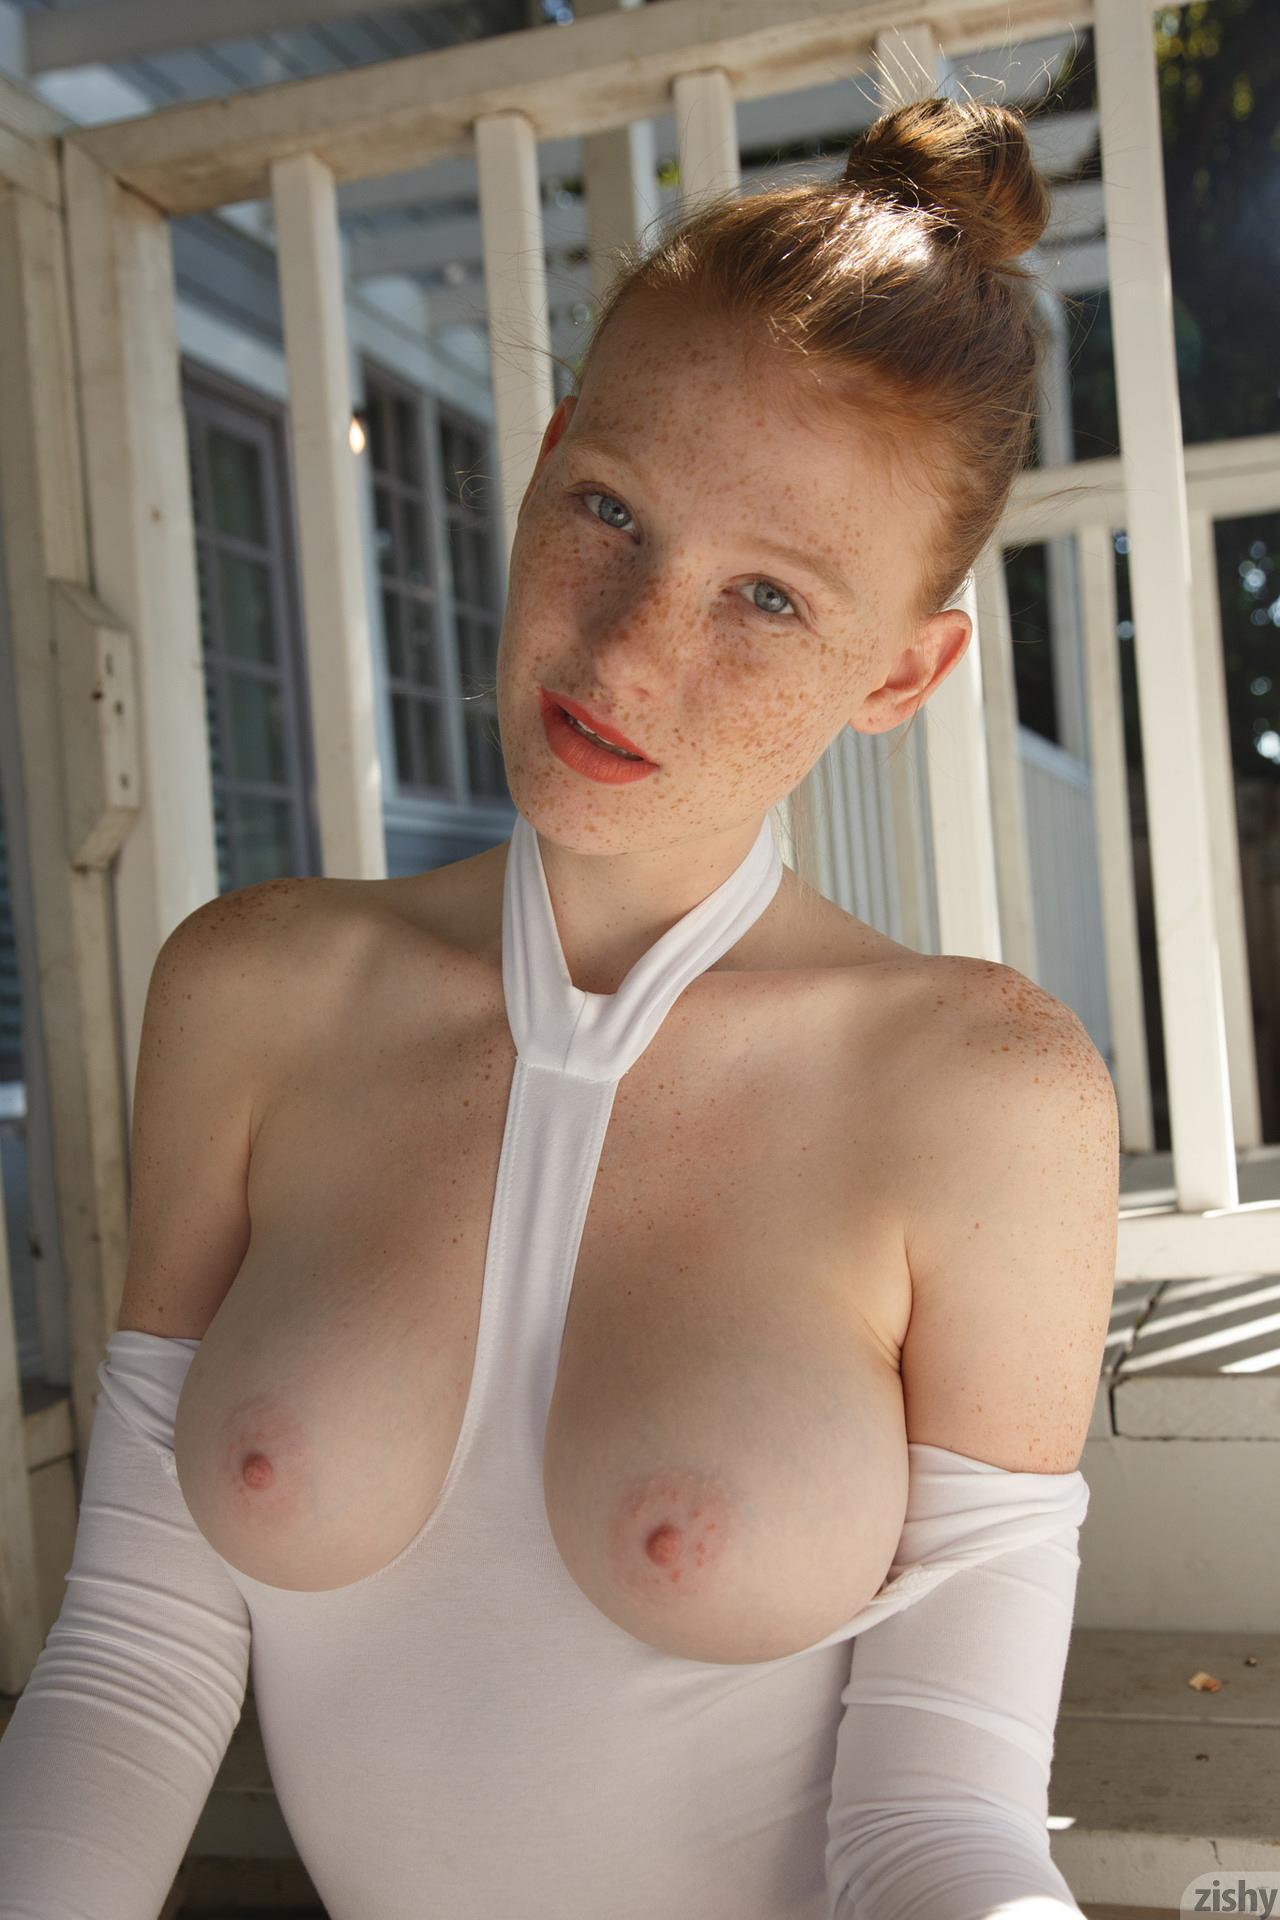 Abby Dark Porn abby visser porn pic - eporner